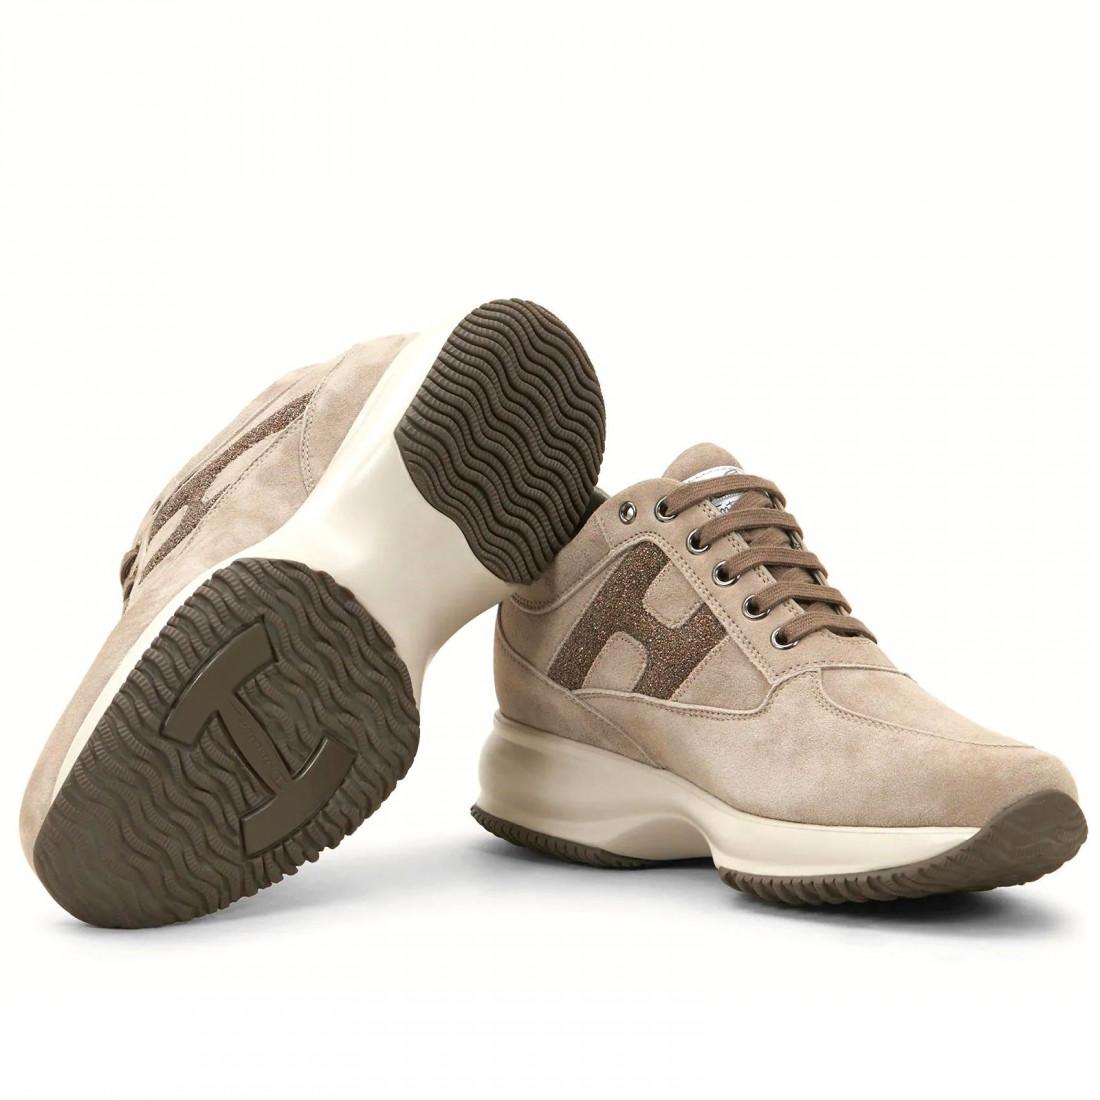 sneakers woman hogan hxw00n0s360o6uc407 7576